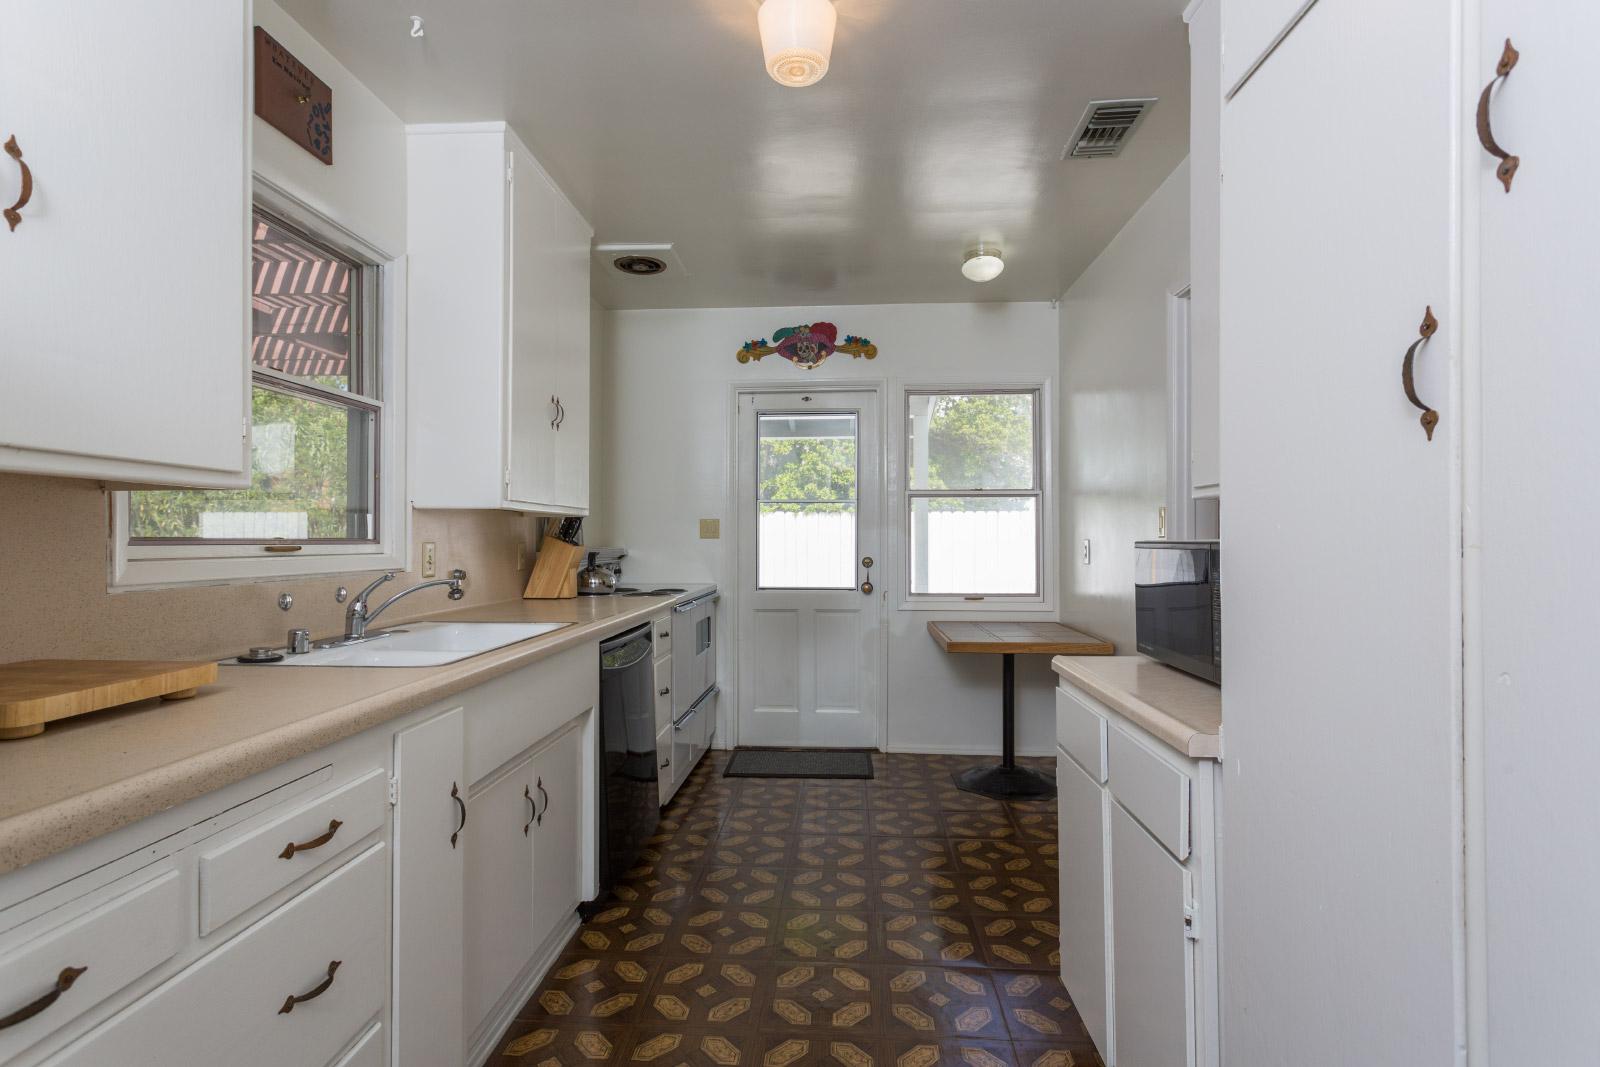 kitchen_16768303165_o.jpg